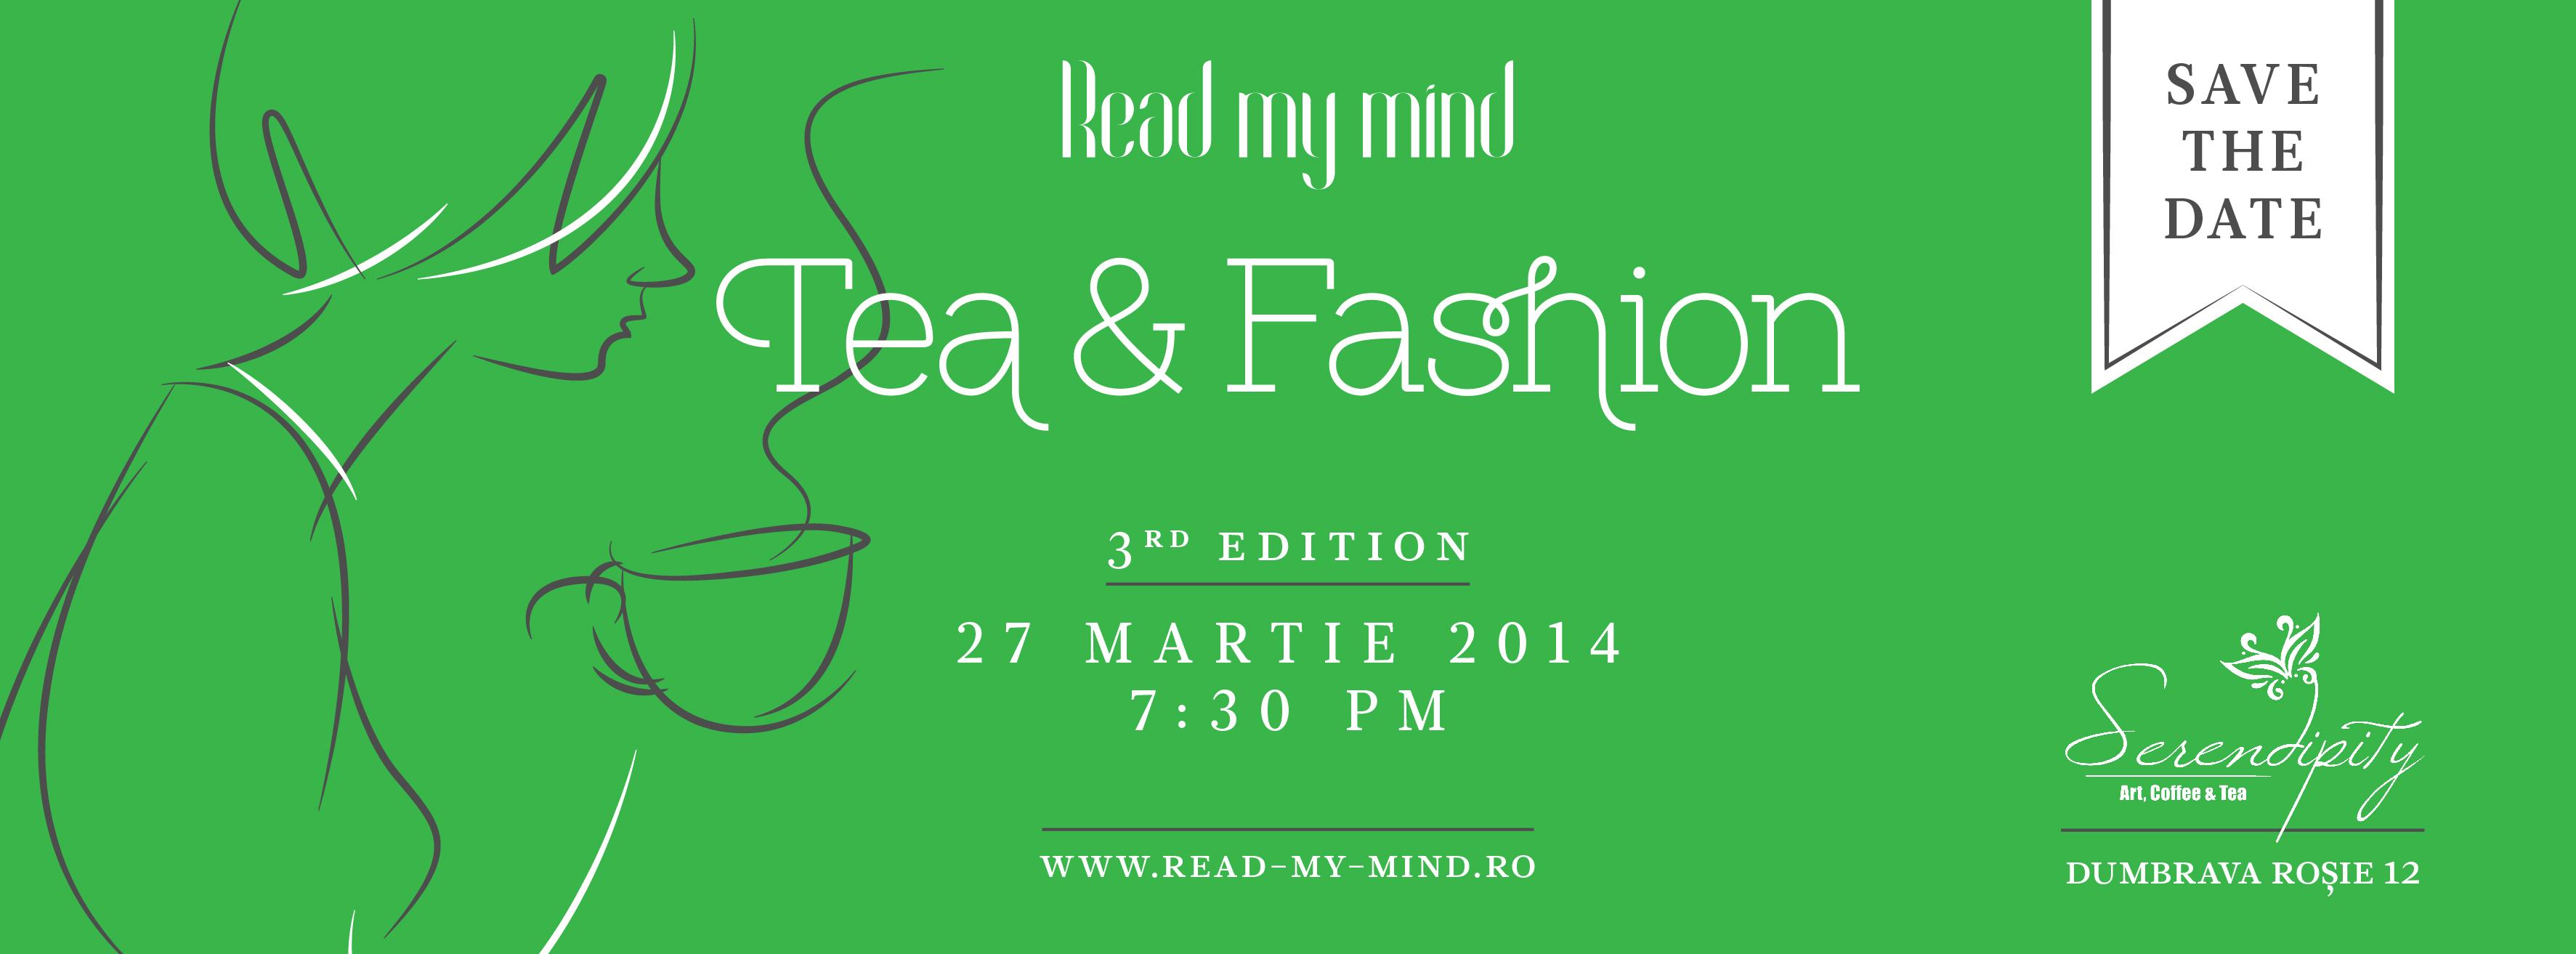 Readmymind tea&fashion 3-SAVE the date: 27 martie 2014